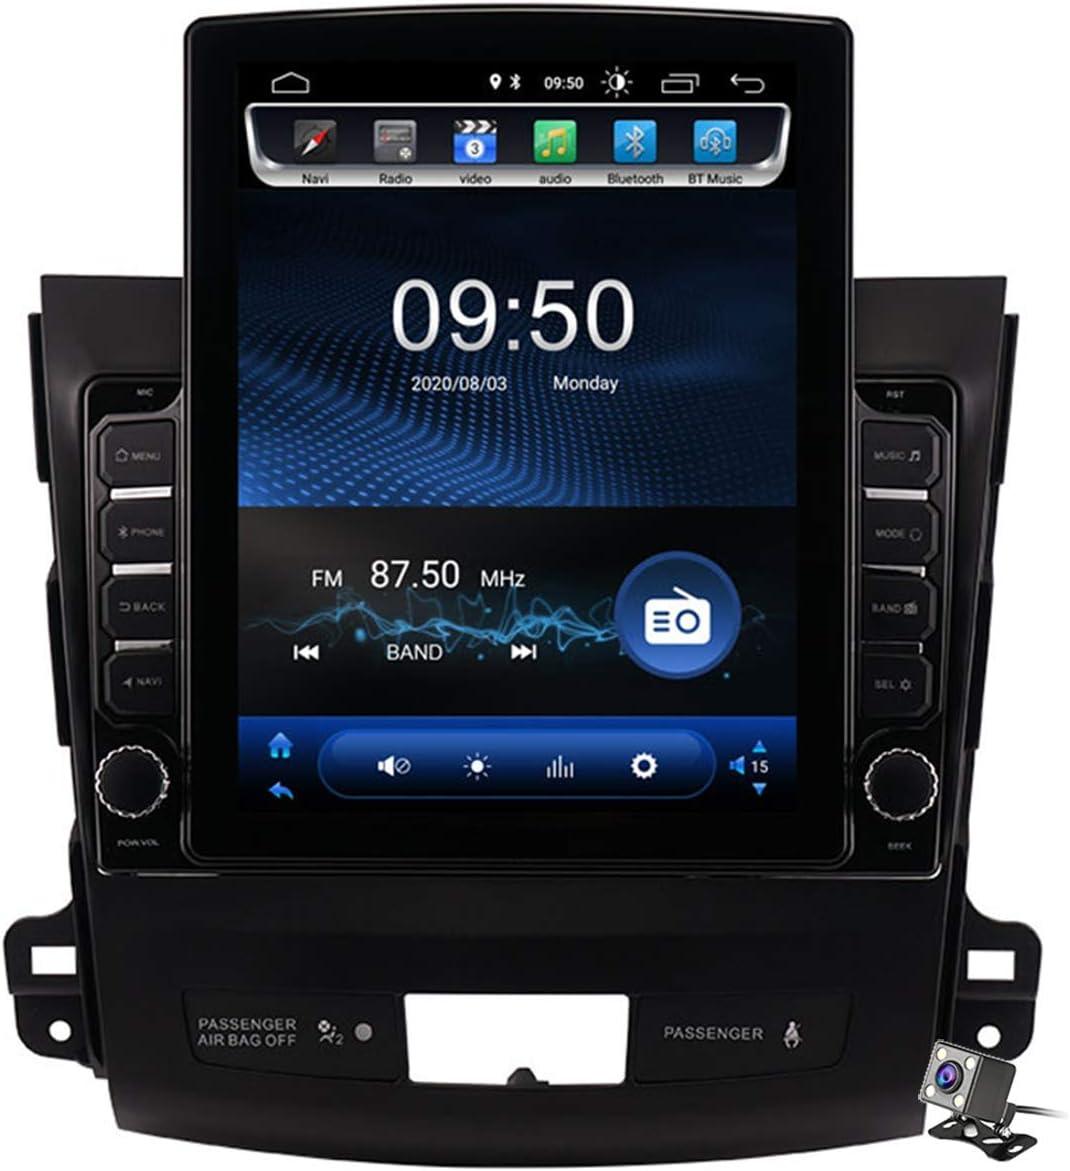 Max 53% OFF mart Car Stereo Android 9.0 Radio for 2005-2011 Mitsubishi Outlander